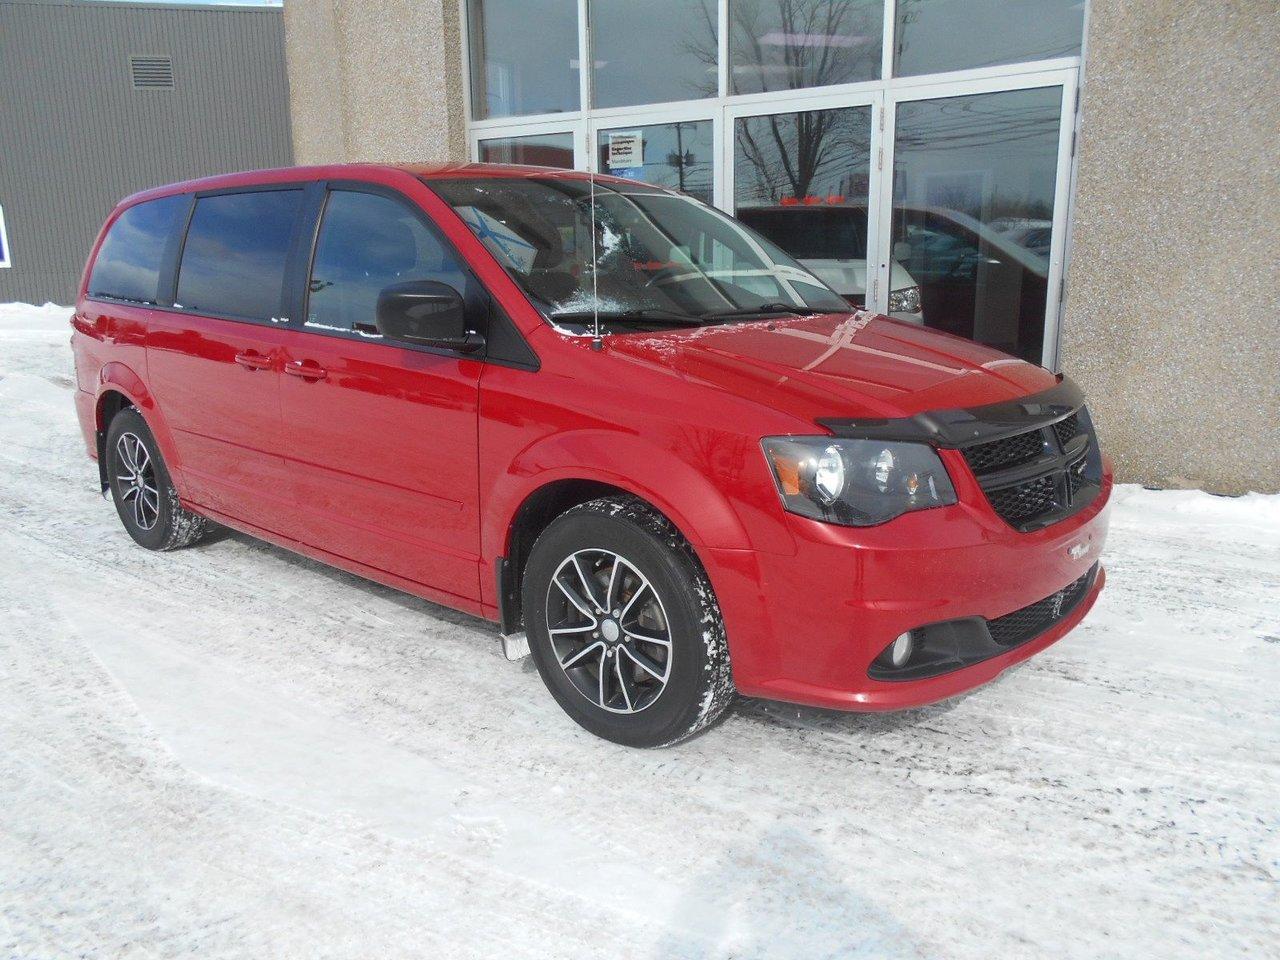 2013 Dodge  Grand Caravan SXT Plus BalckTop